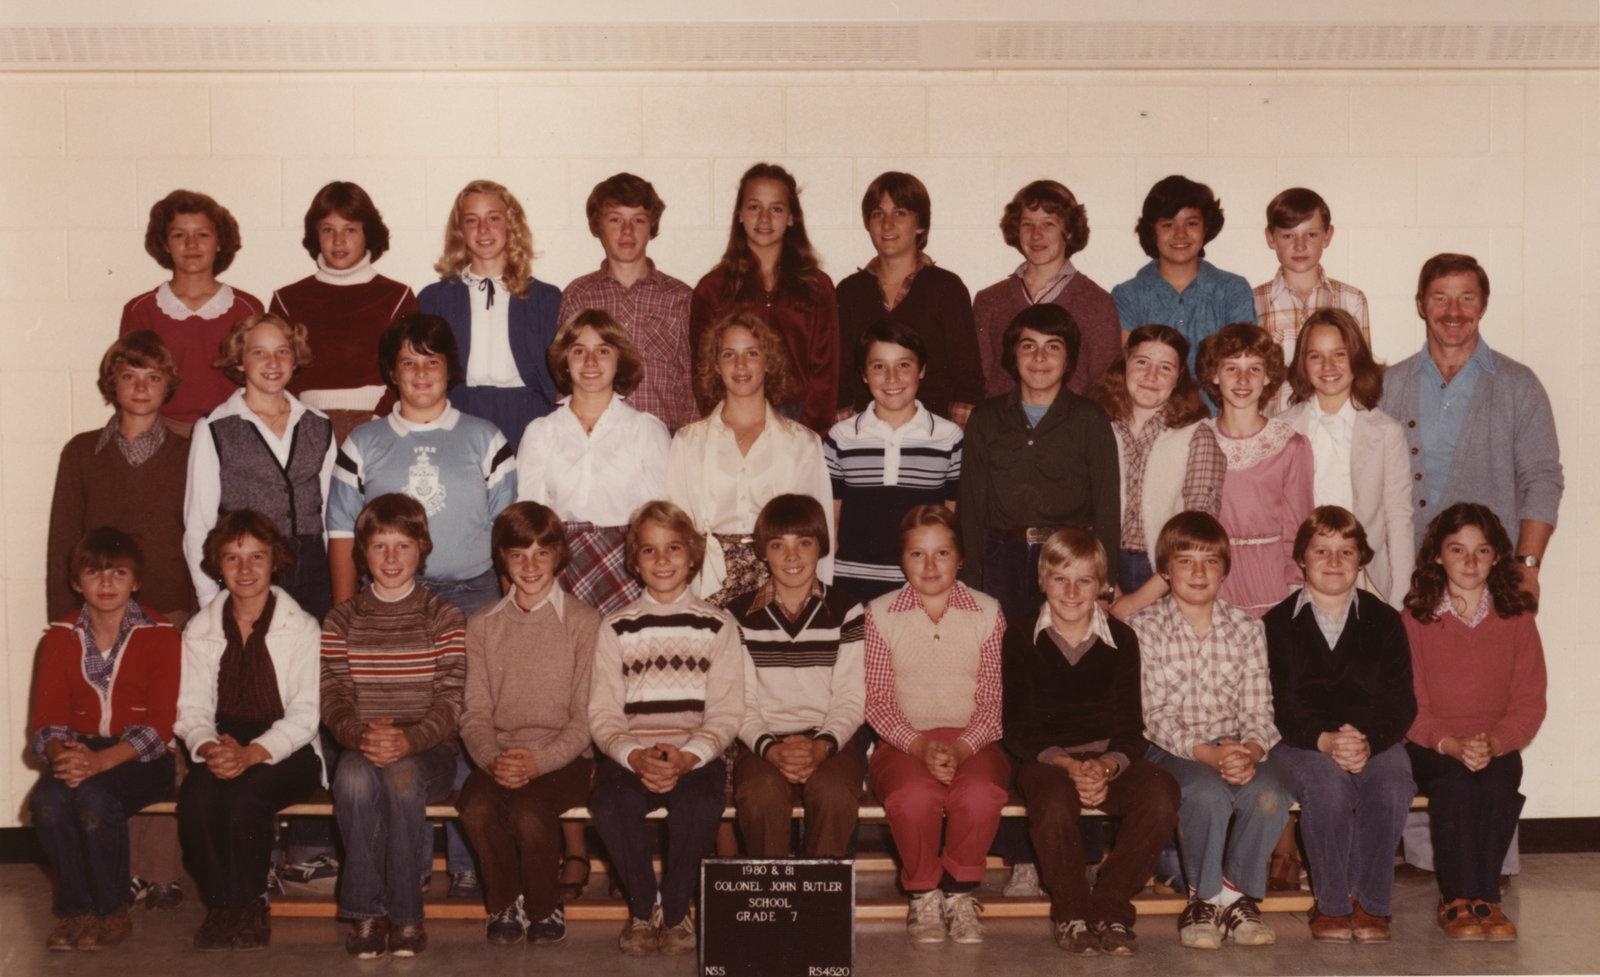 Colonel John Butler Public School, 1980-81, grade 7